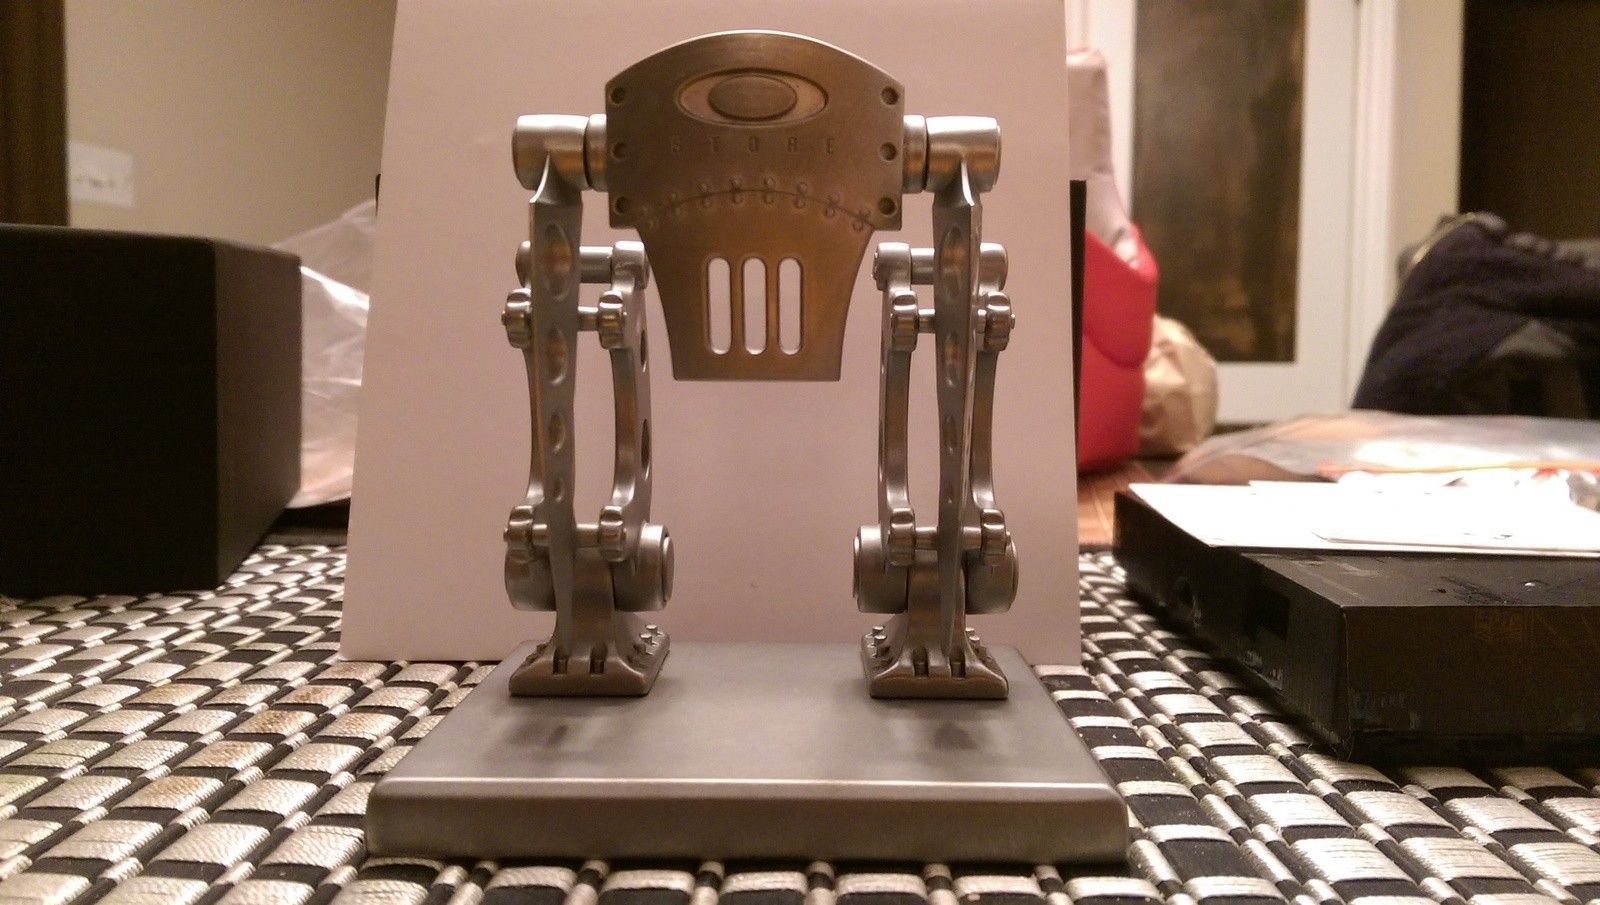 Robotic store front #499 - IMAG0524.jpg